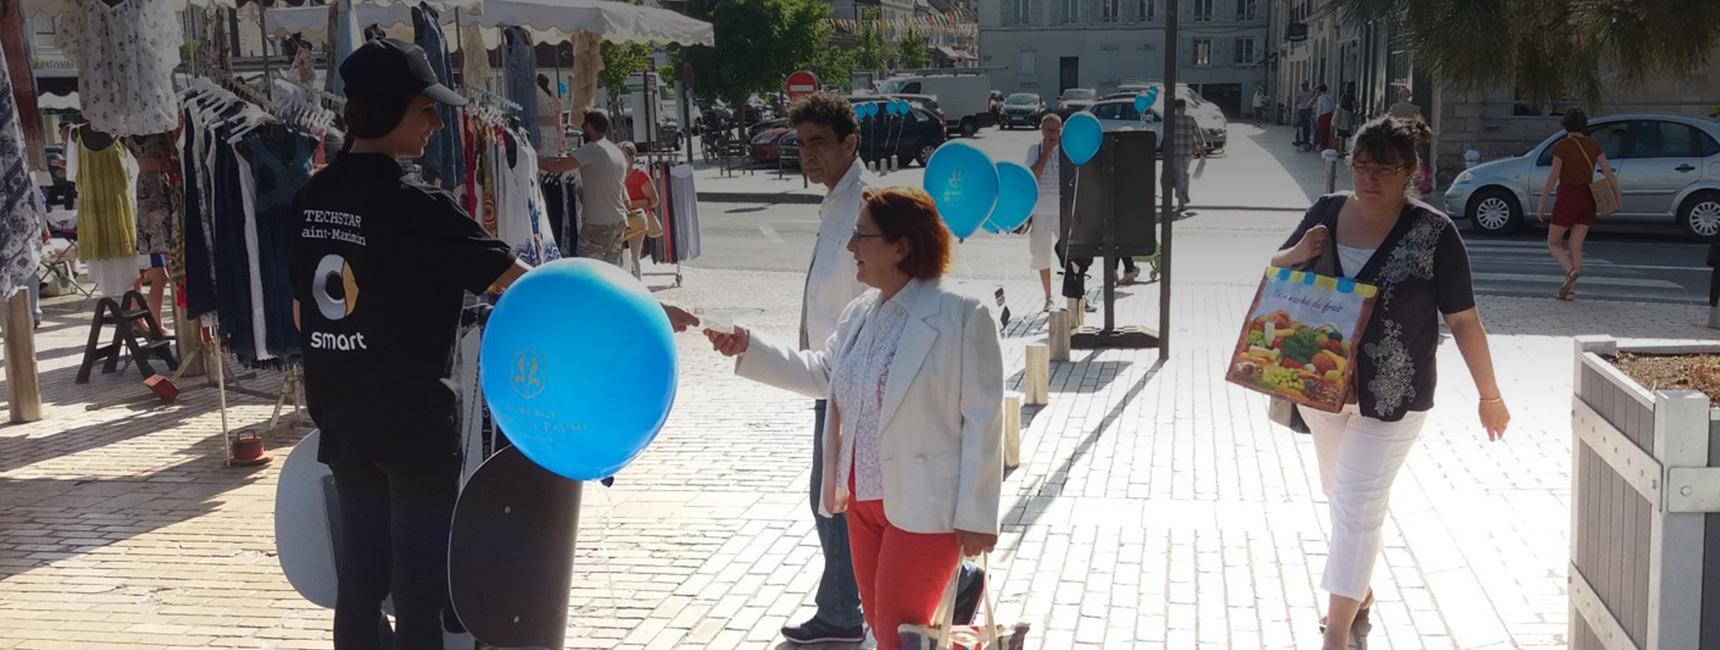 Segway Street Marketing Keemia Lille Agence marketing local en région Nord